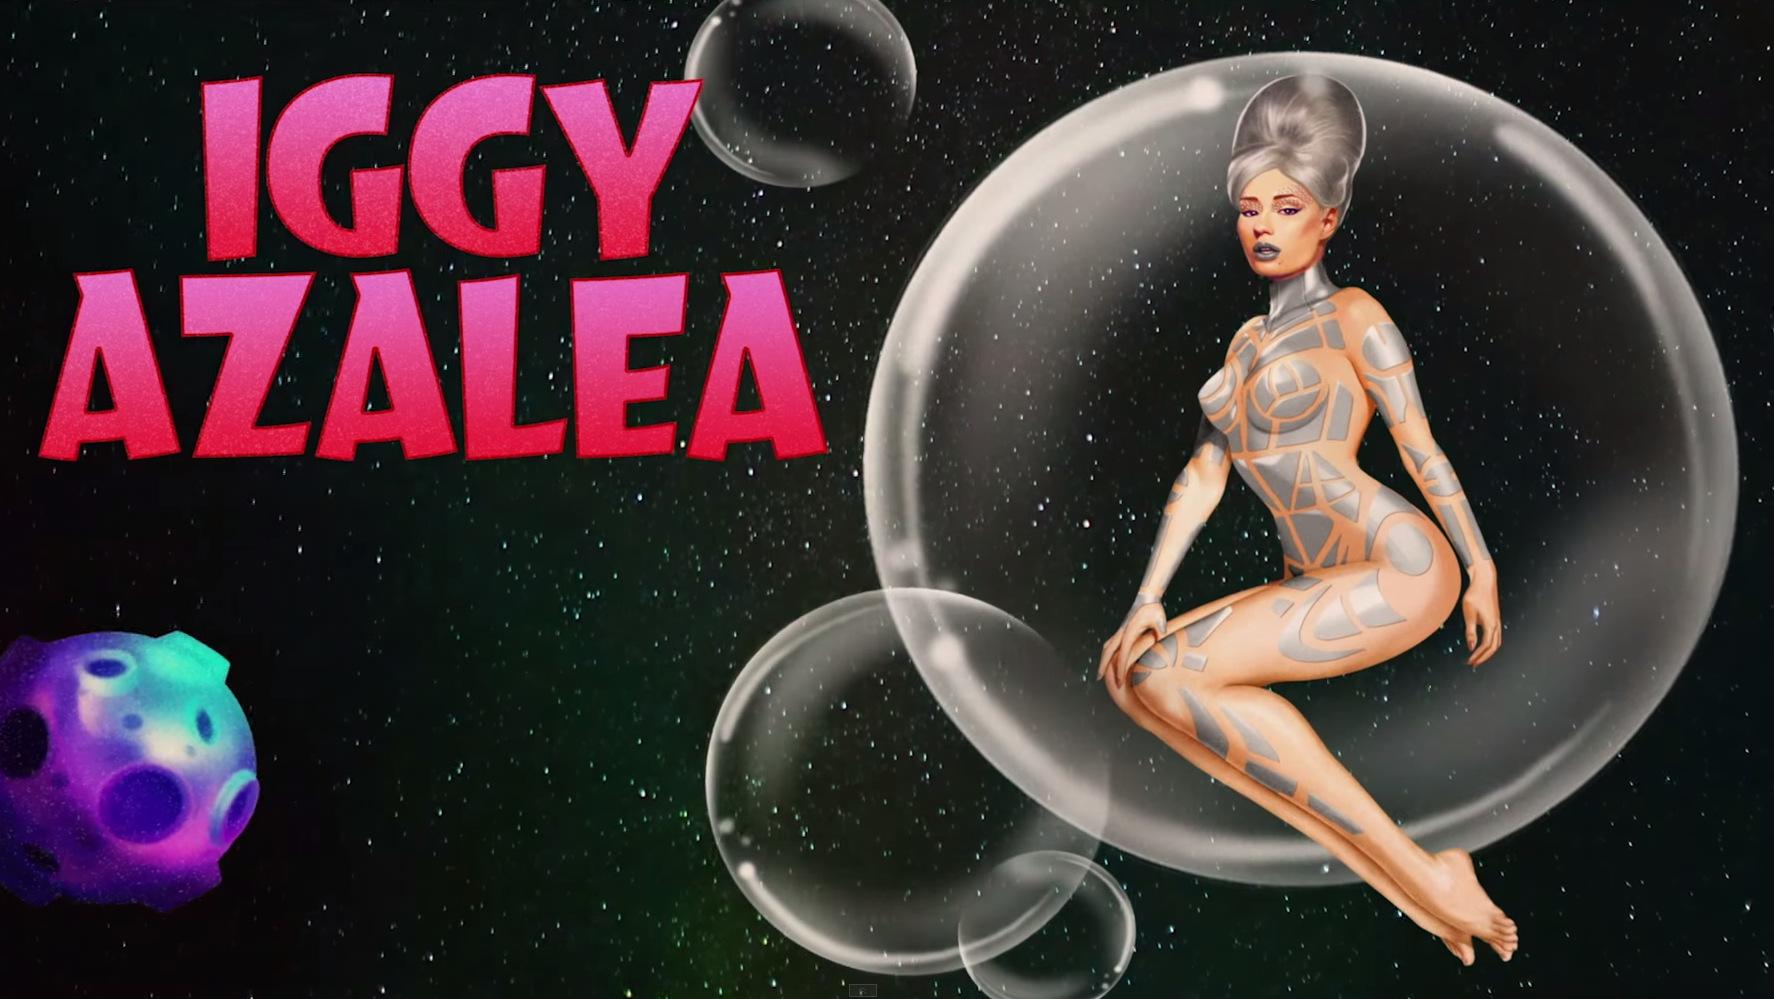 Britney Spears Iggy Azalea Samsung ad (5)